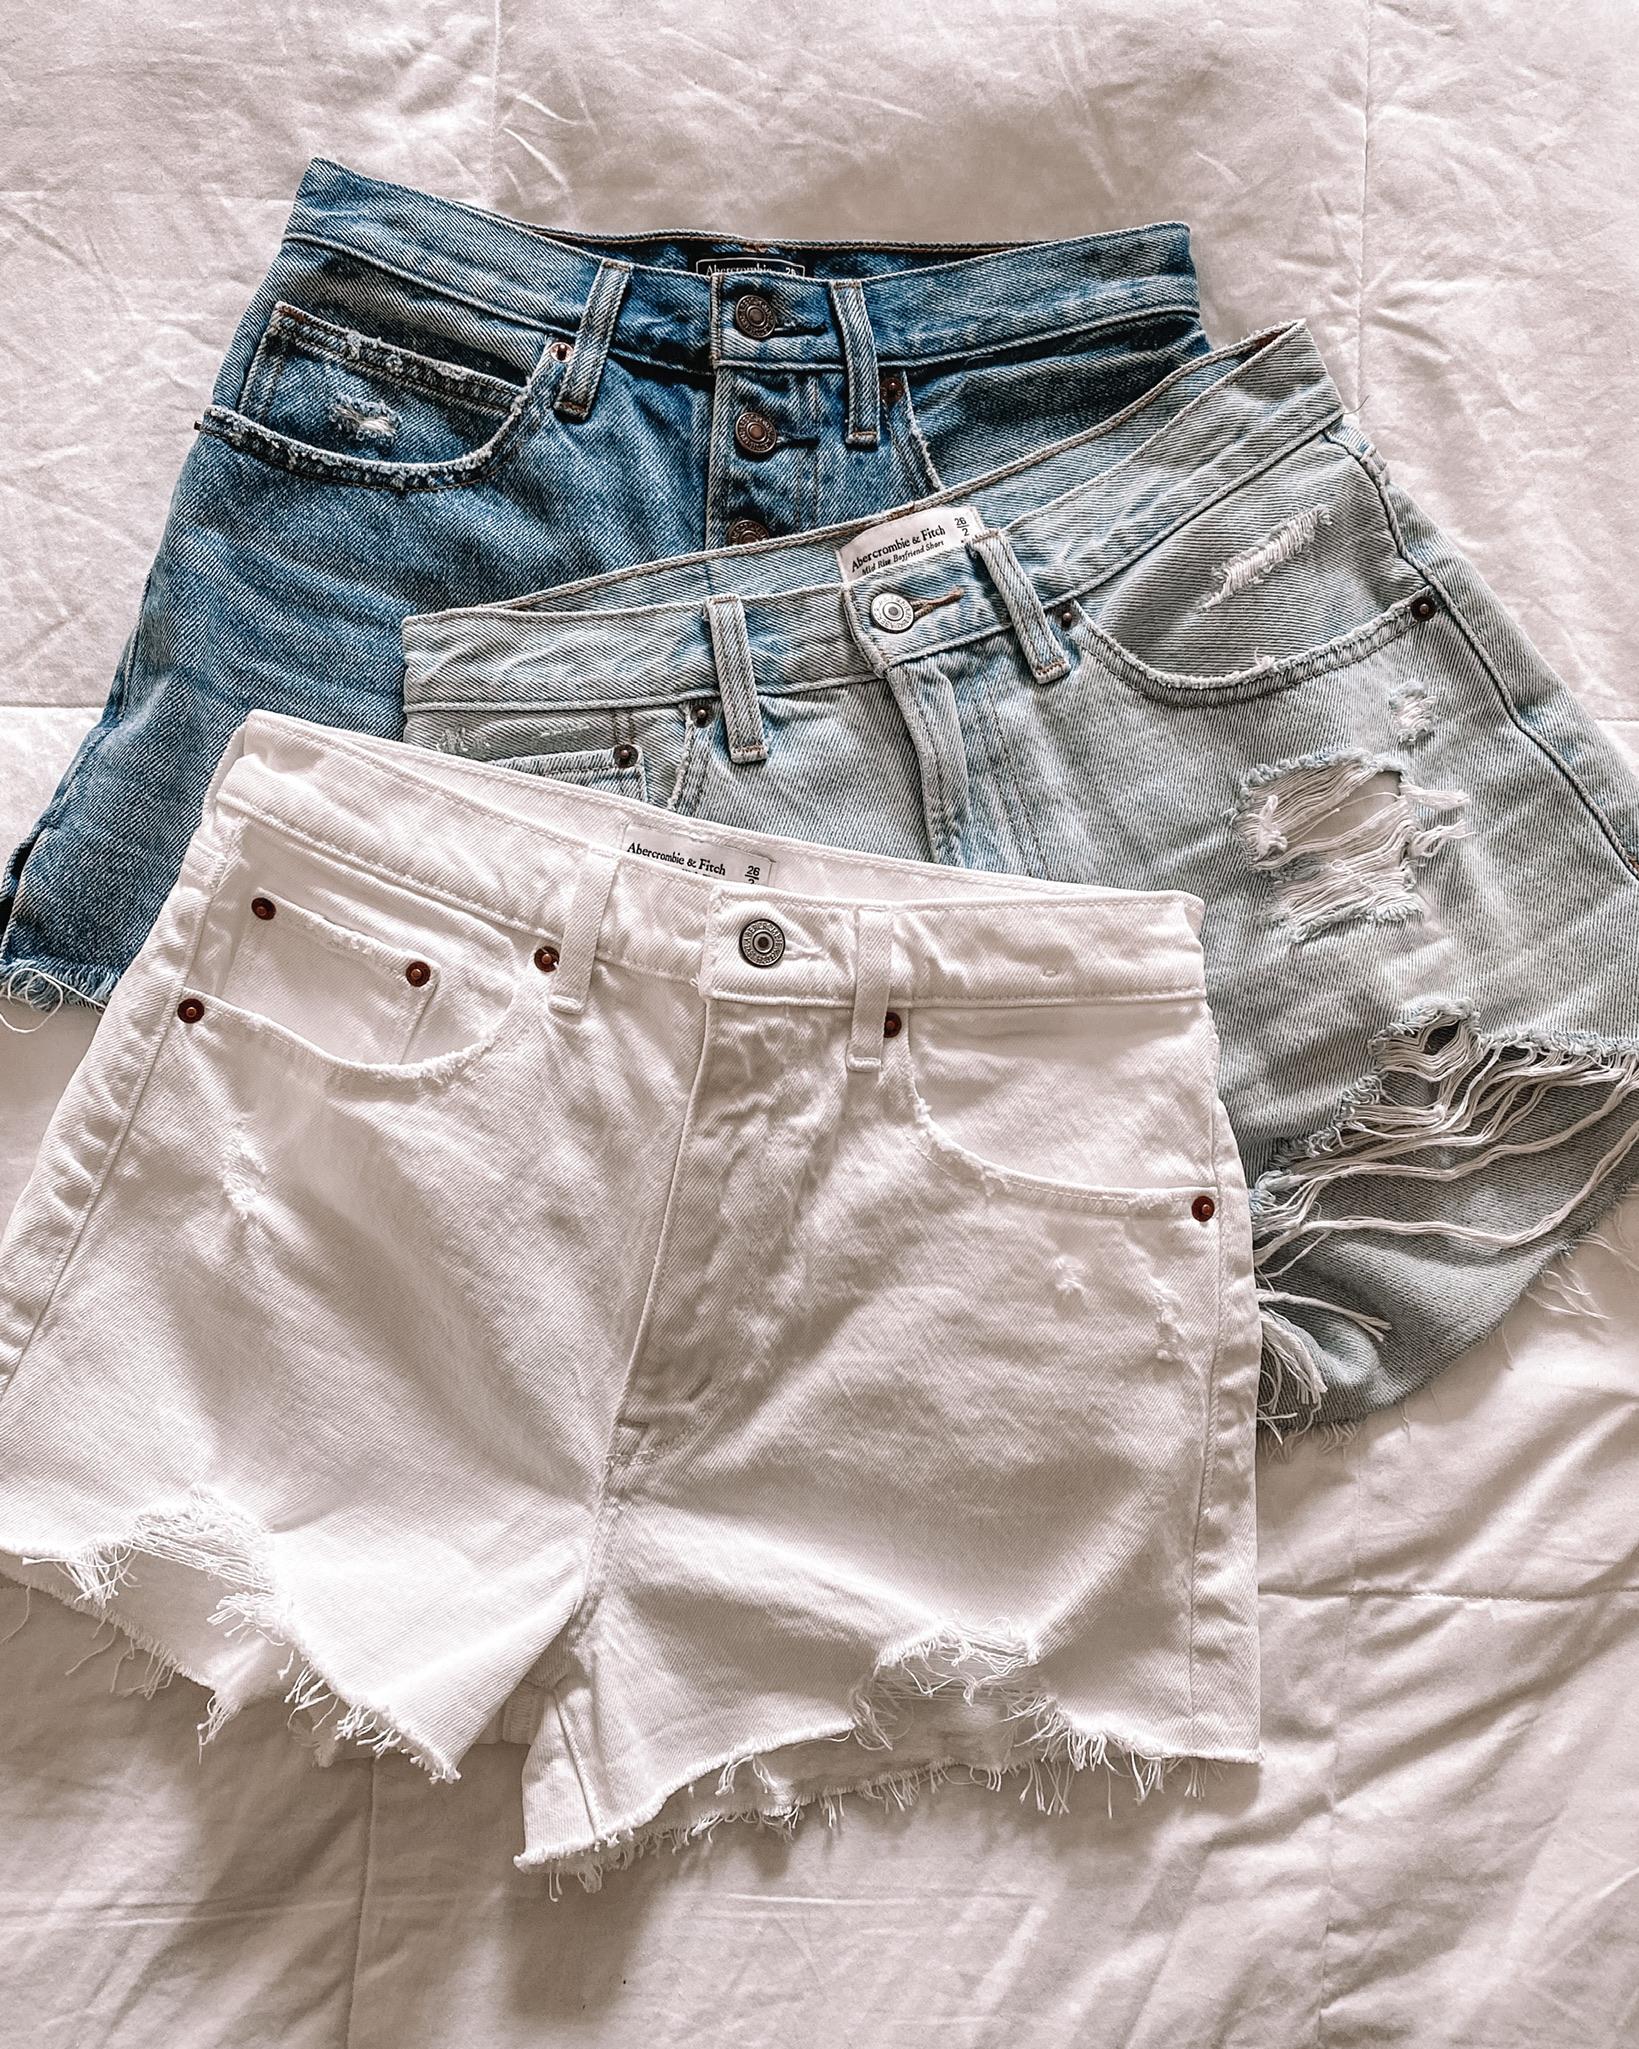 Fashion Jackson Abercrombie Ripped Denim Shorts White Jean Shorts